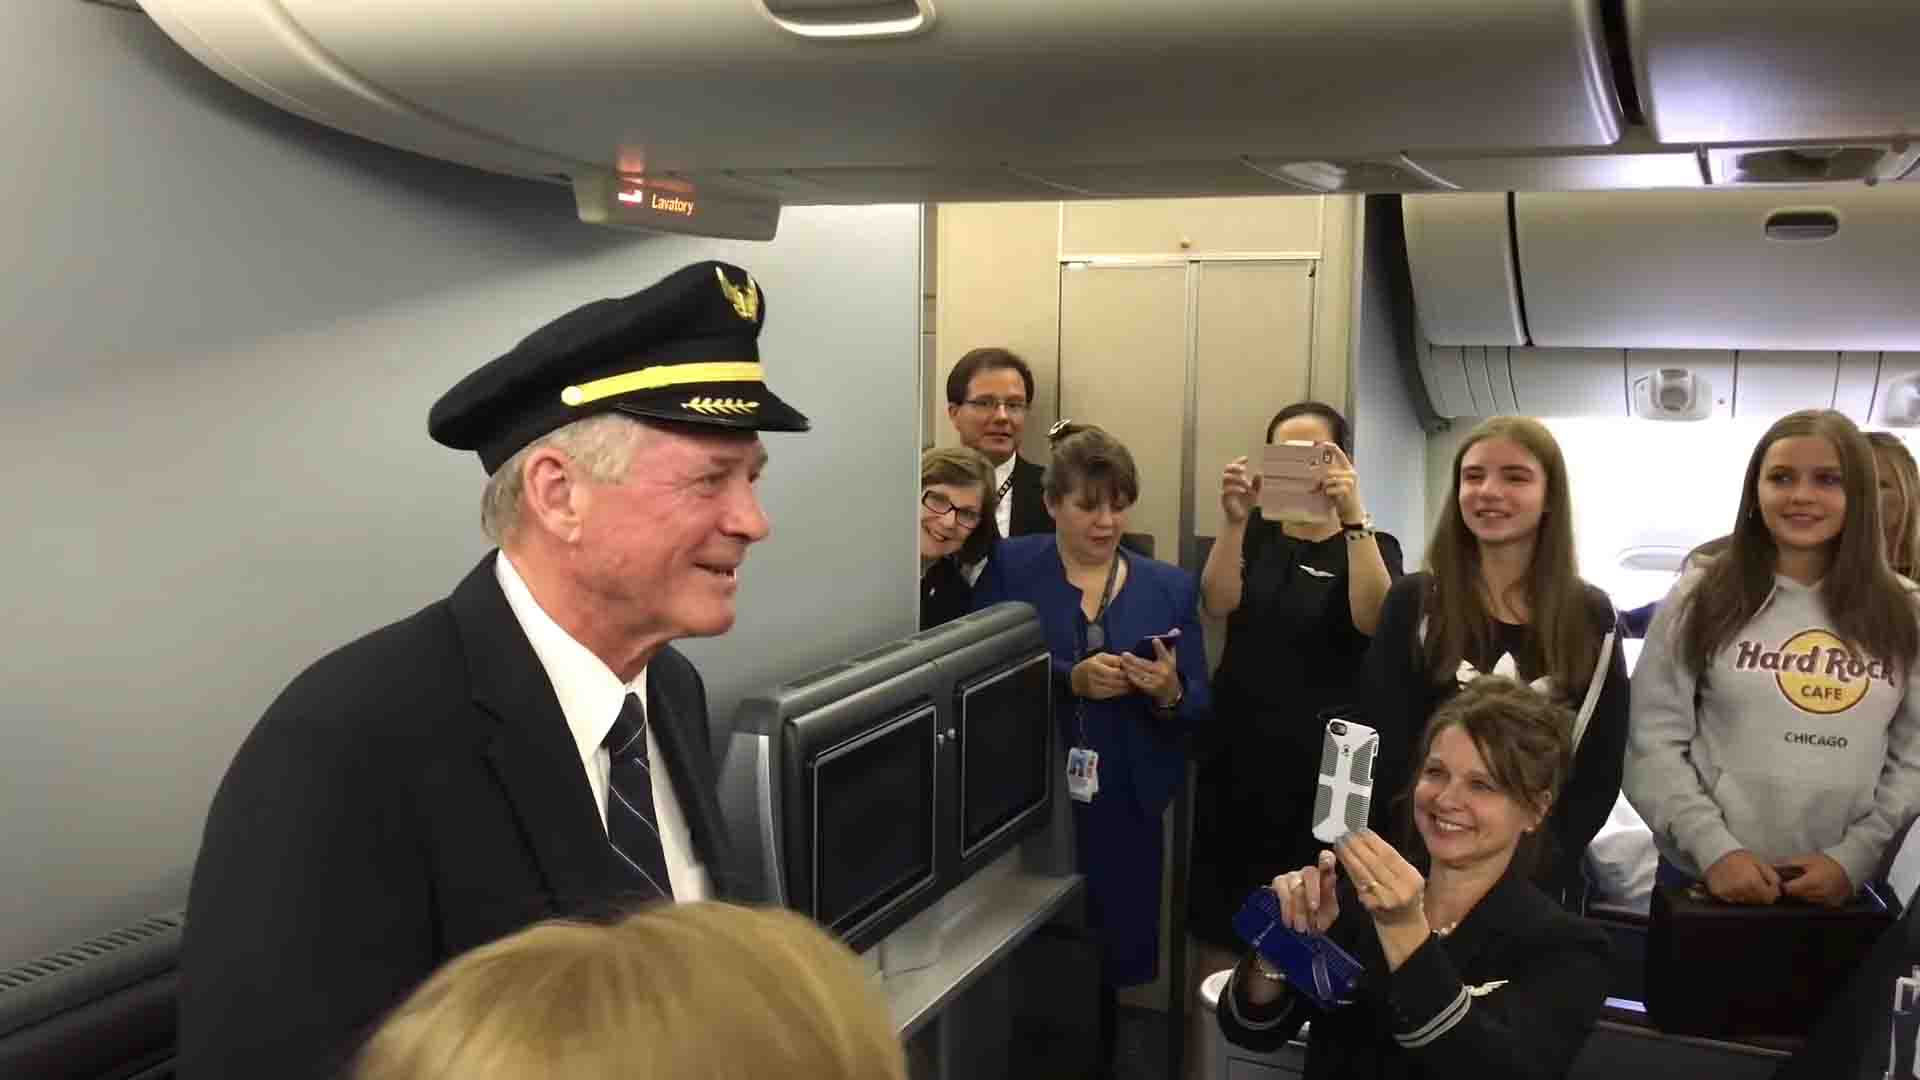 Students-choir-acappella-captain-last-flight